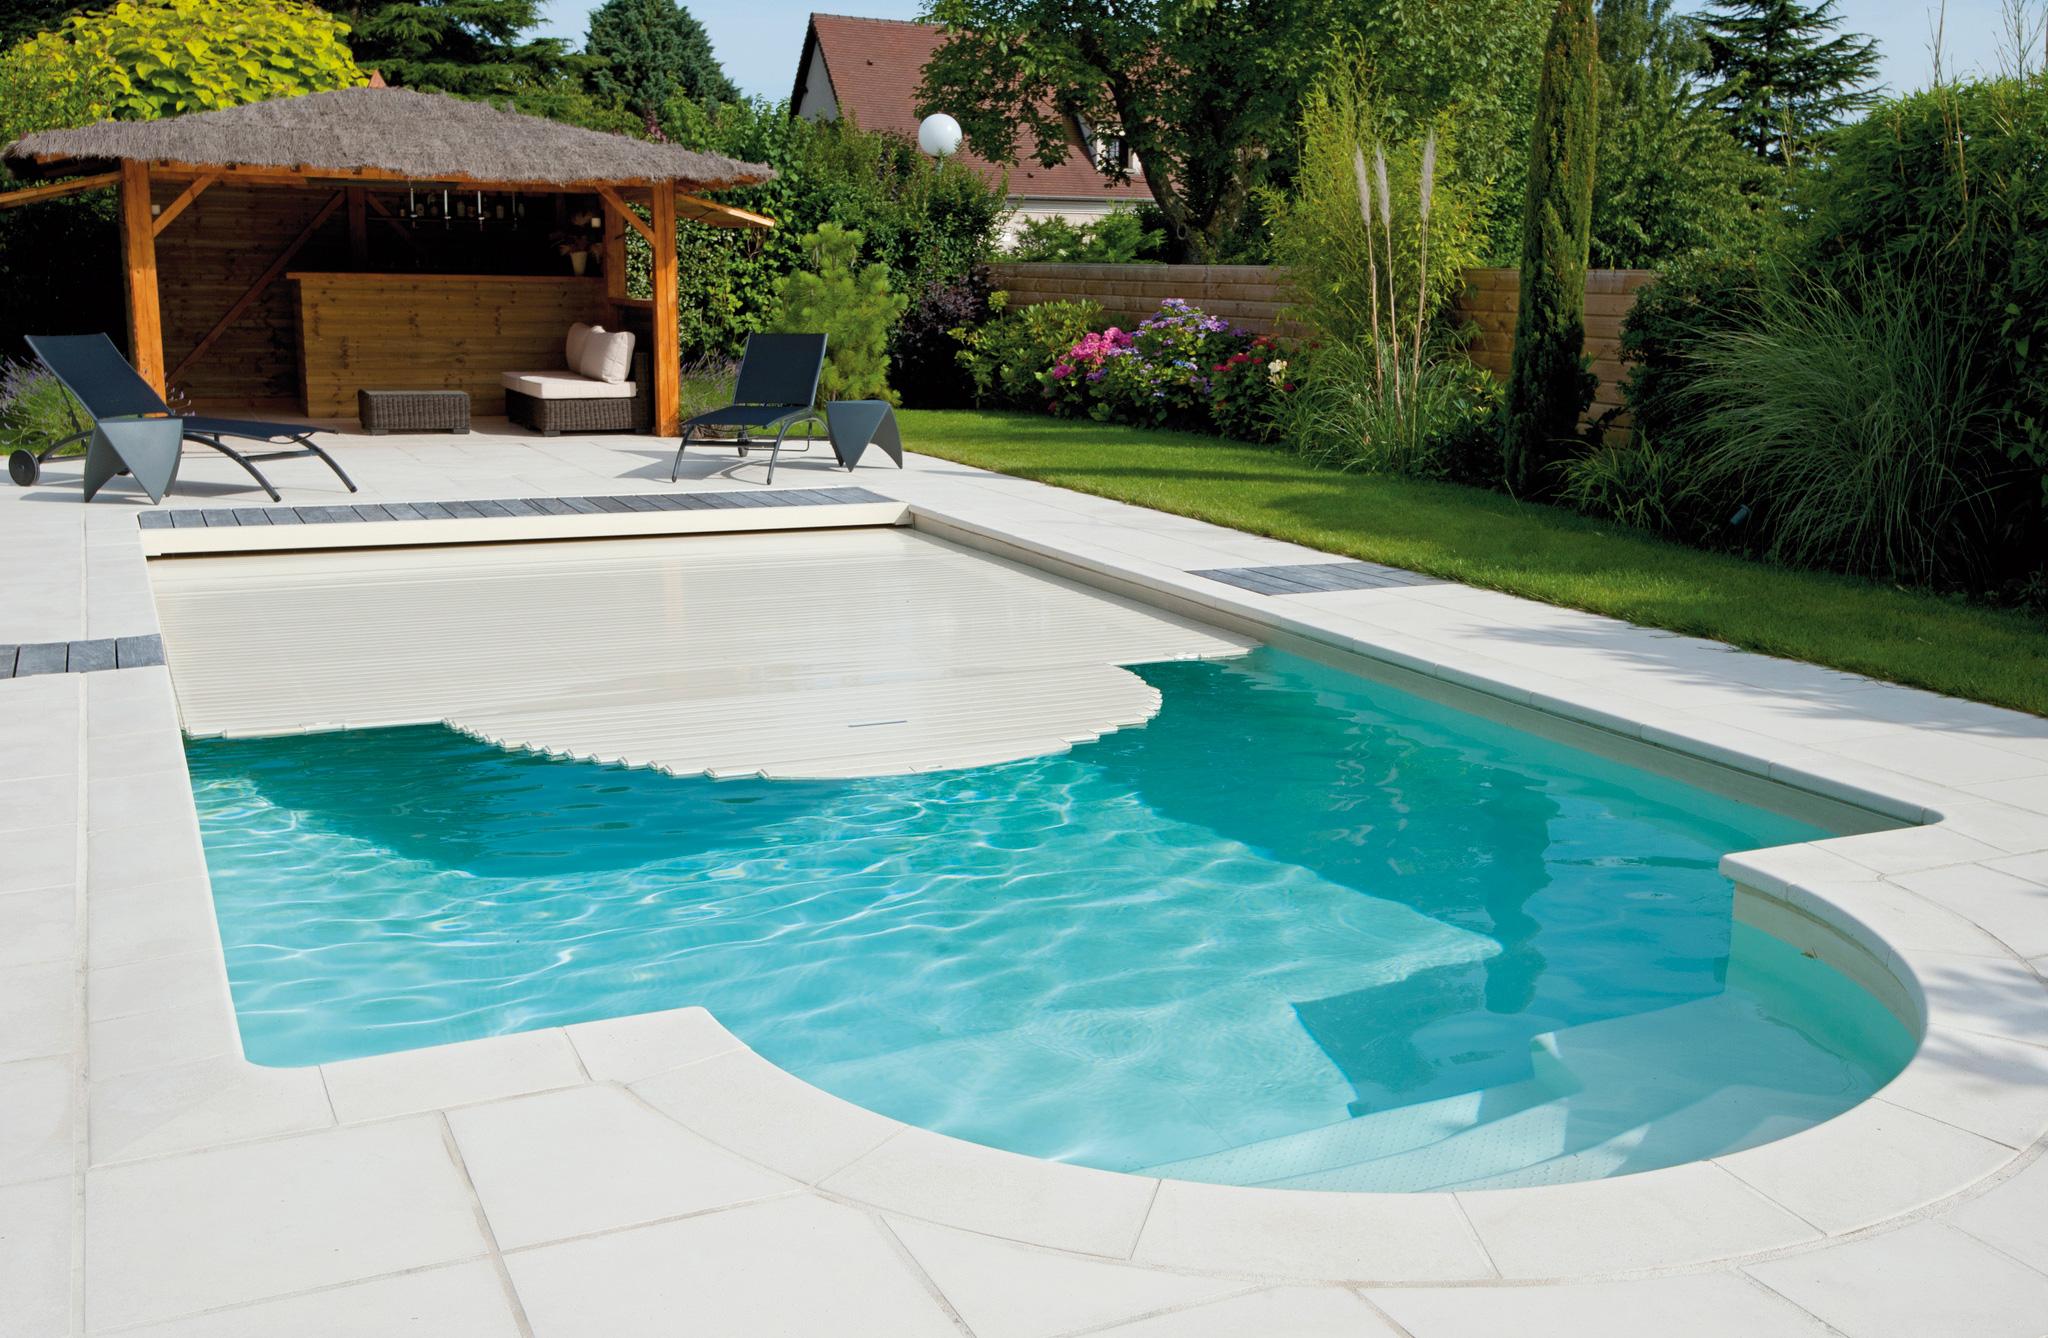 Extrem Poolabdeckung – Desjoyaux Pools YU85